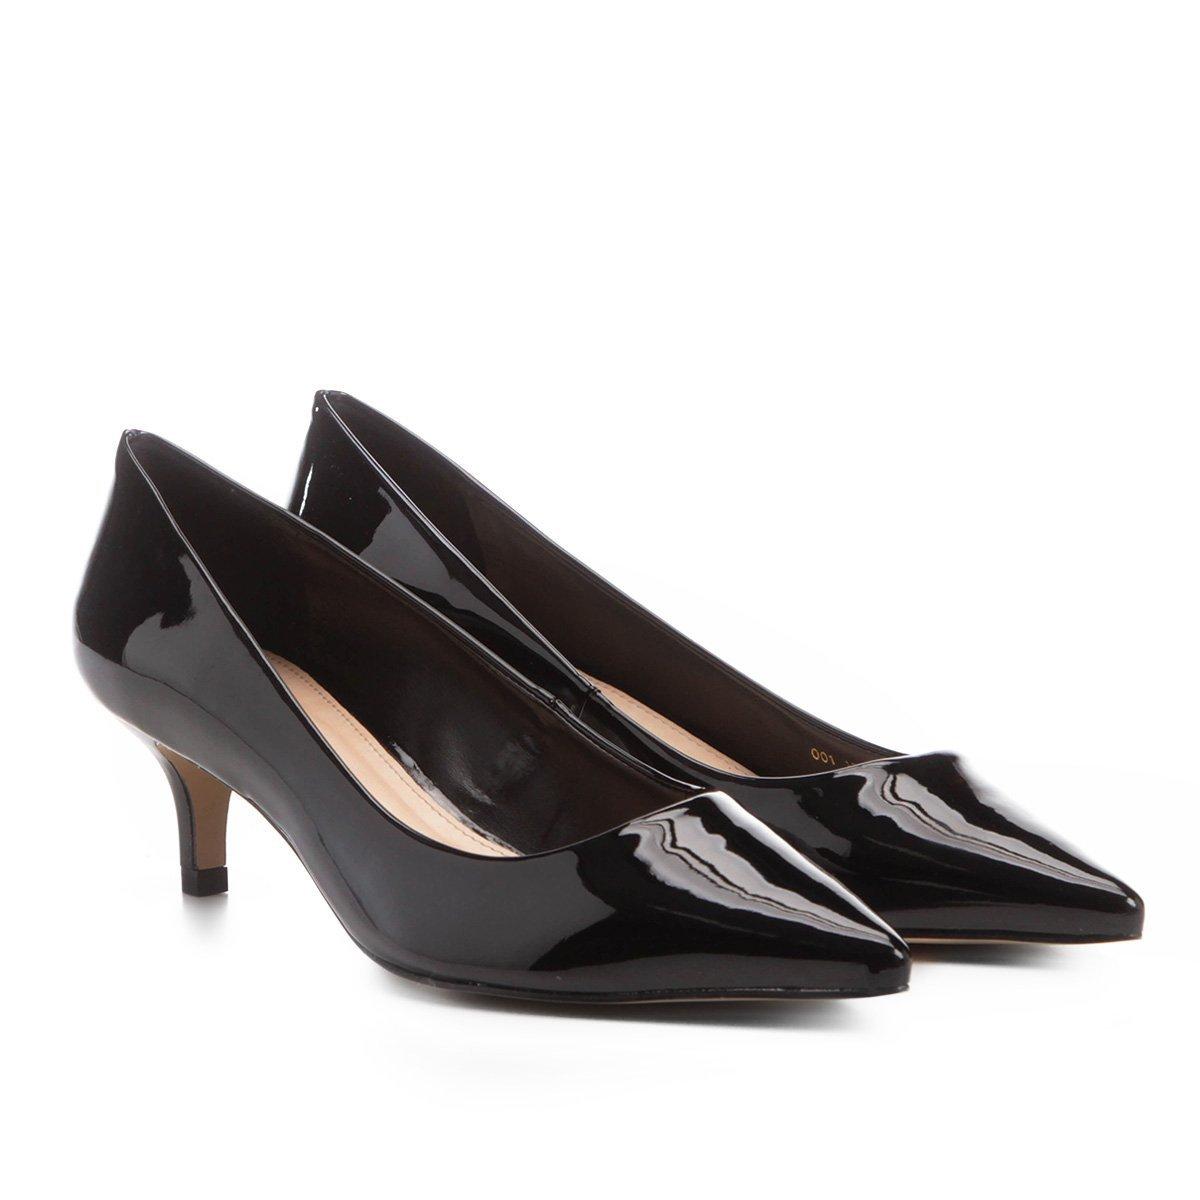 609c08ba3 Scarpin Shoestock Salto Médio Verniz - Preto - Compre Agora